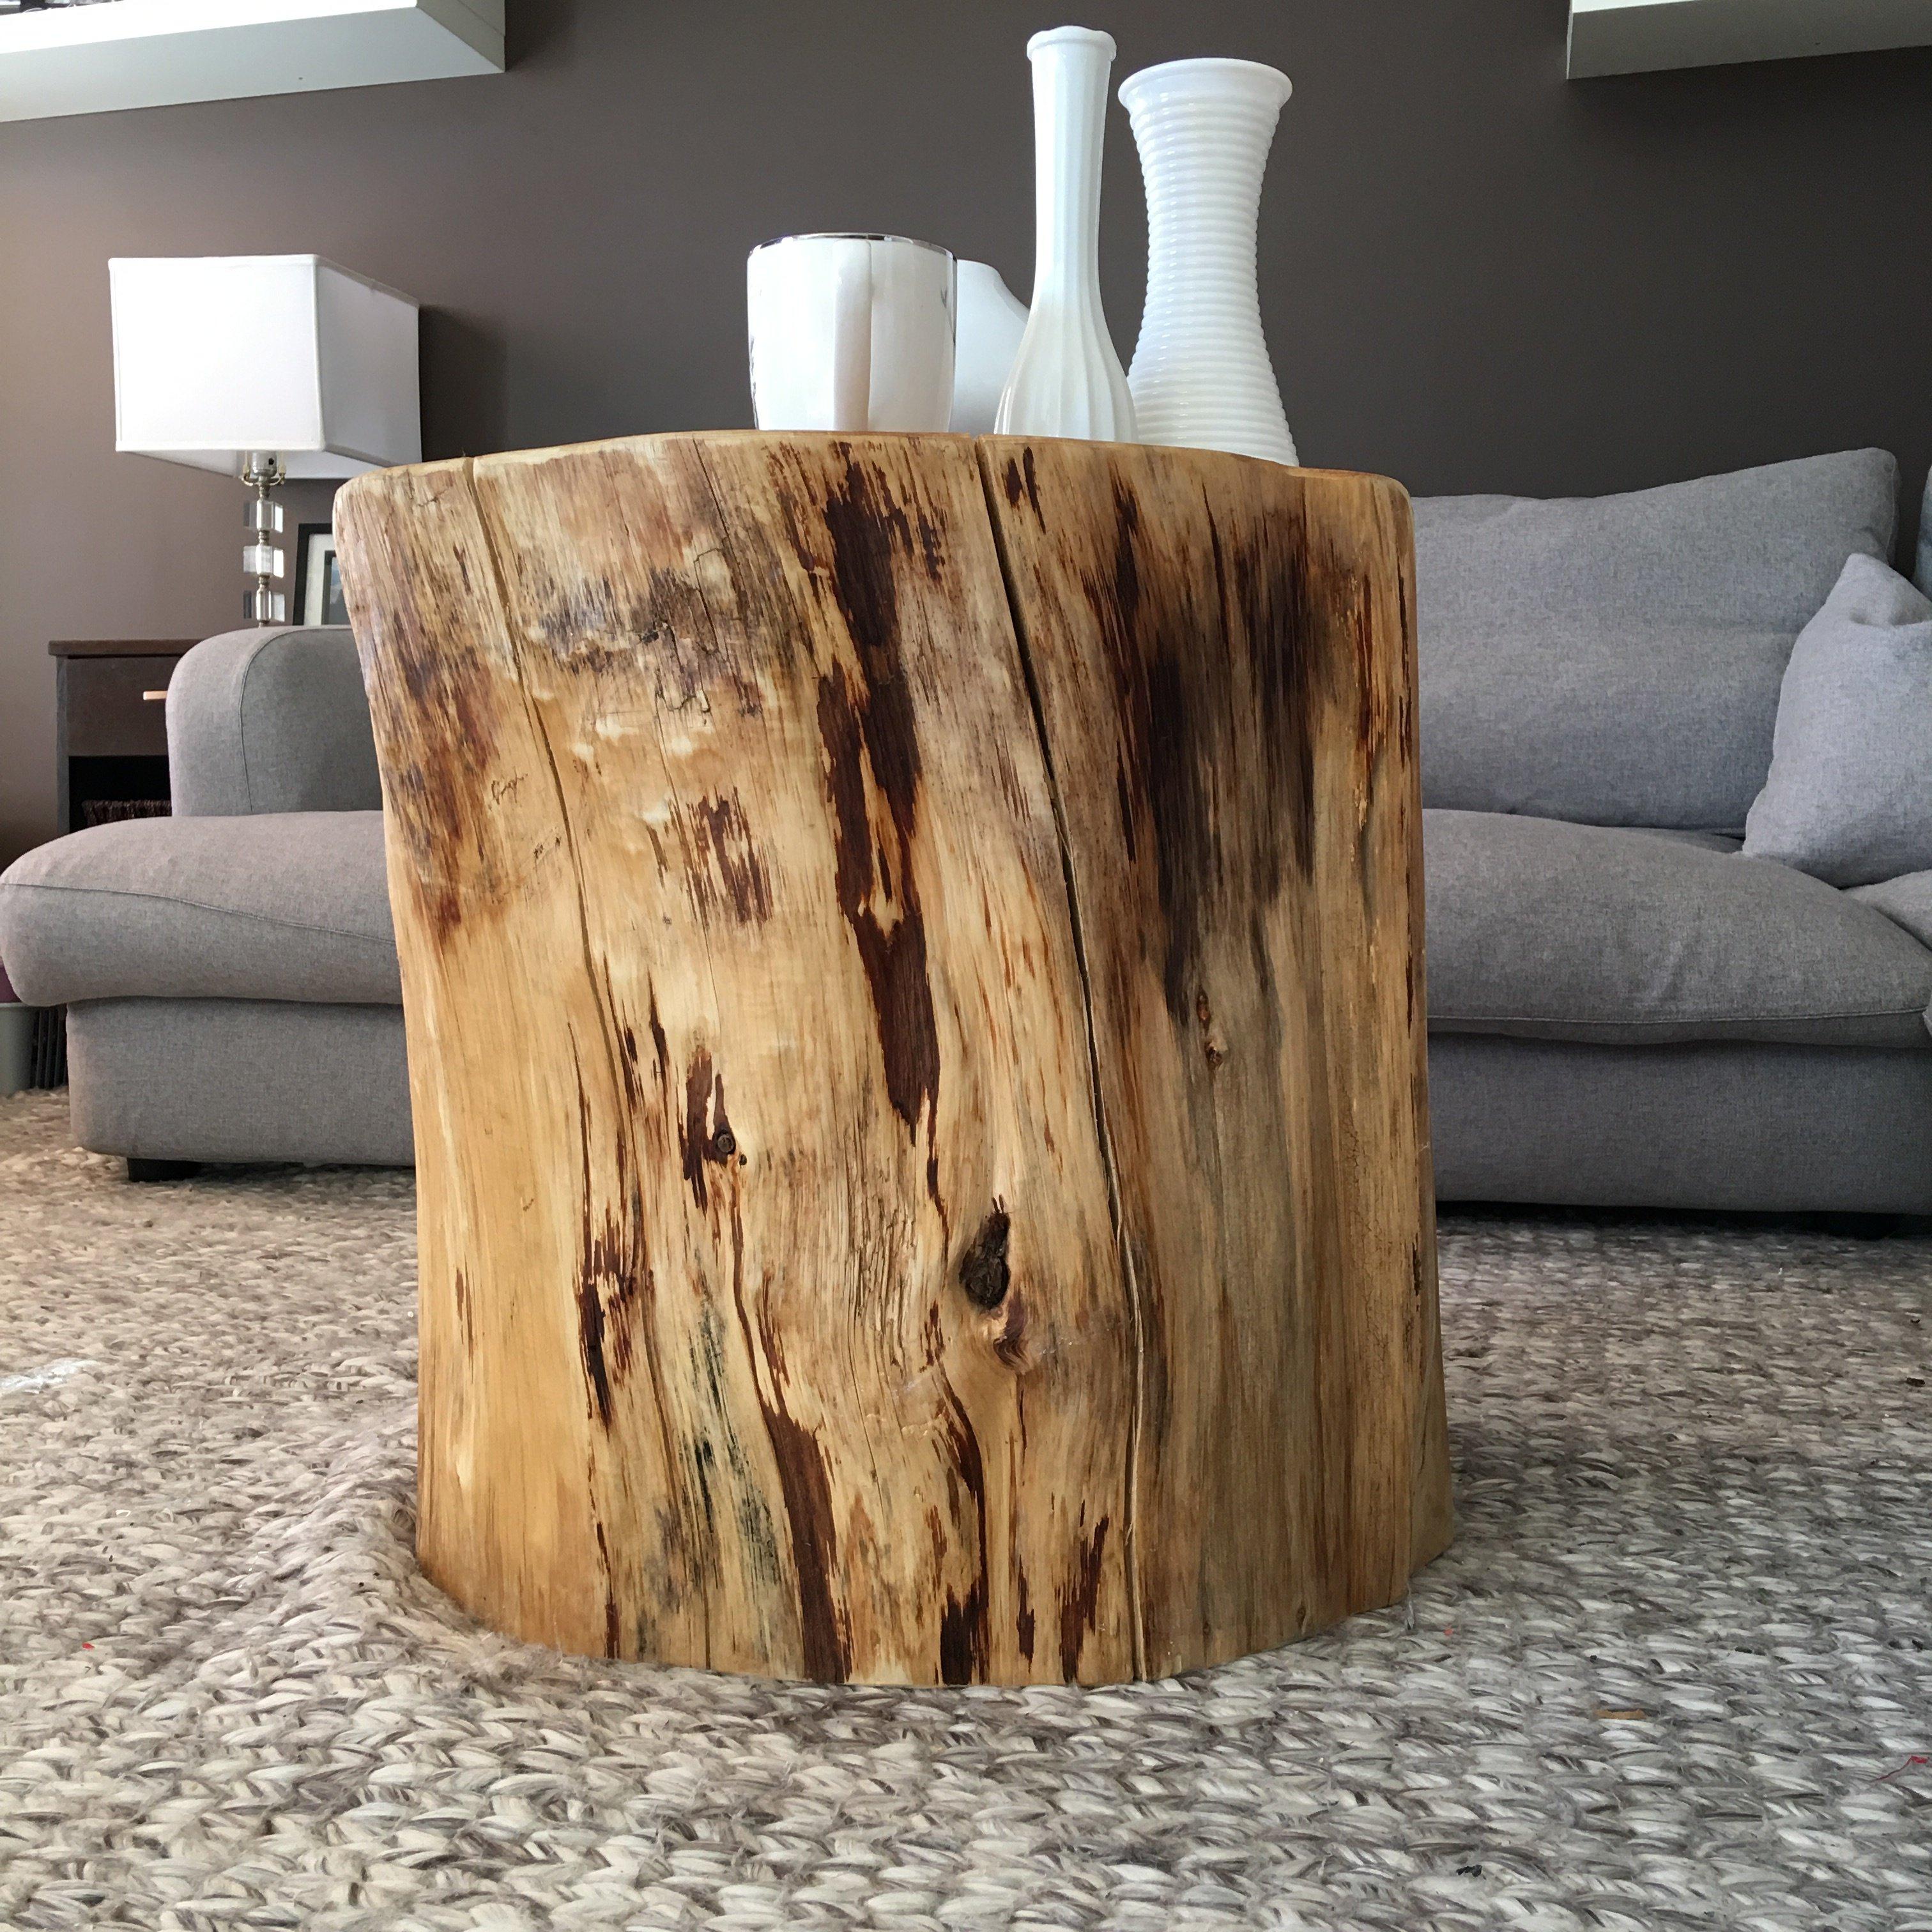 83 Cedar Stump Coffee Table Furniture Stump Coffee Table Amazing